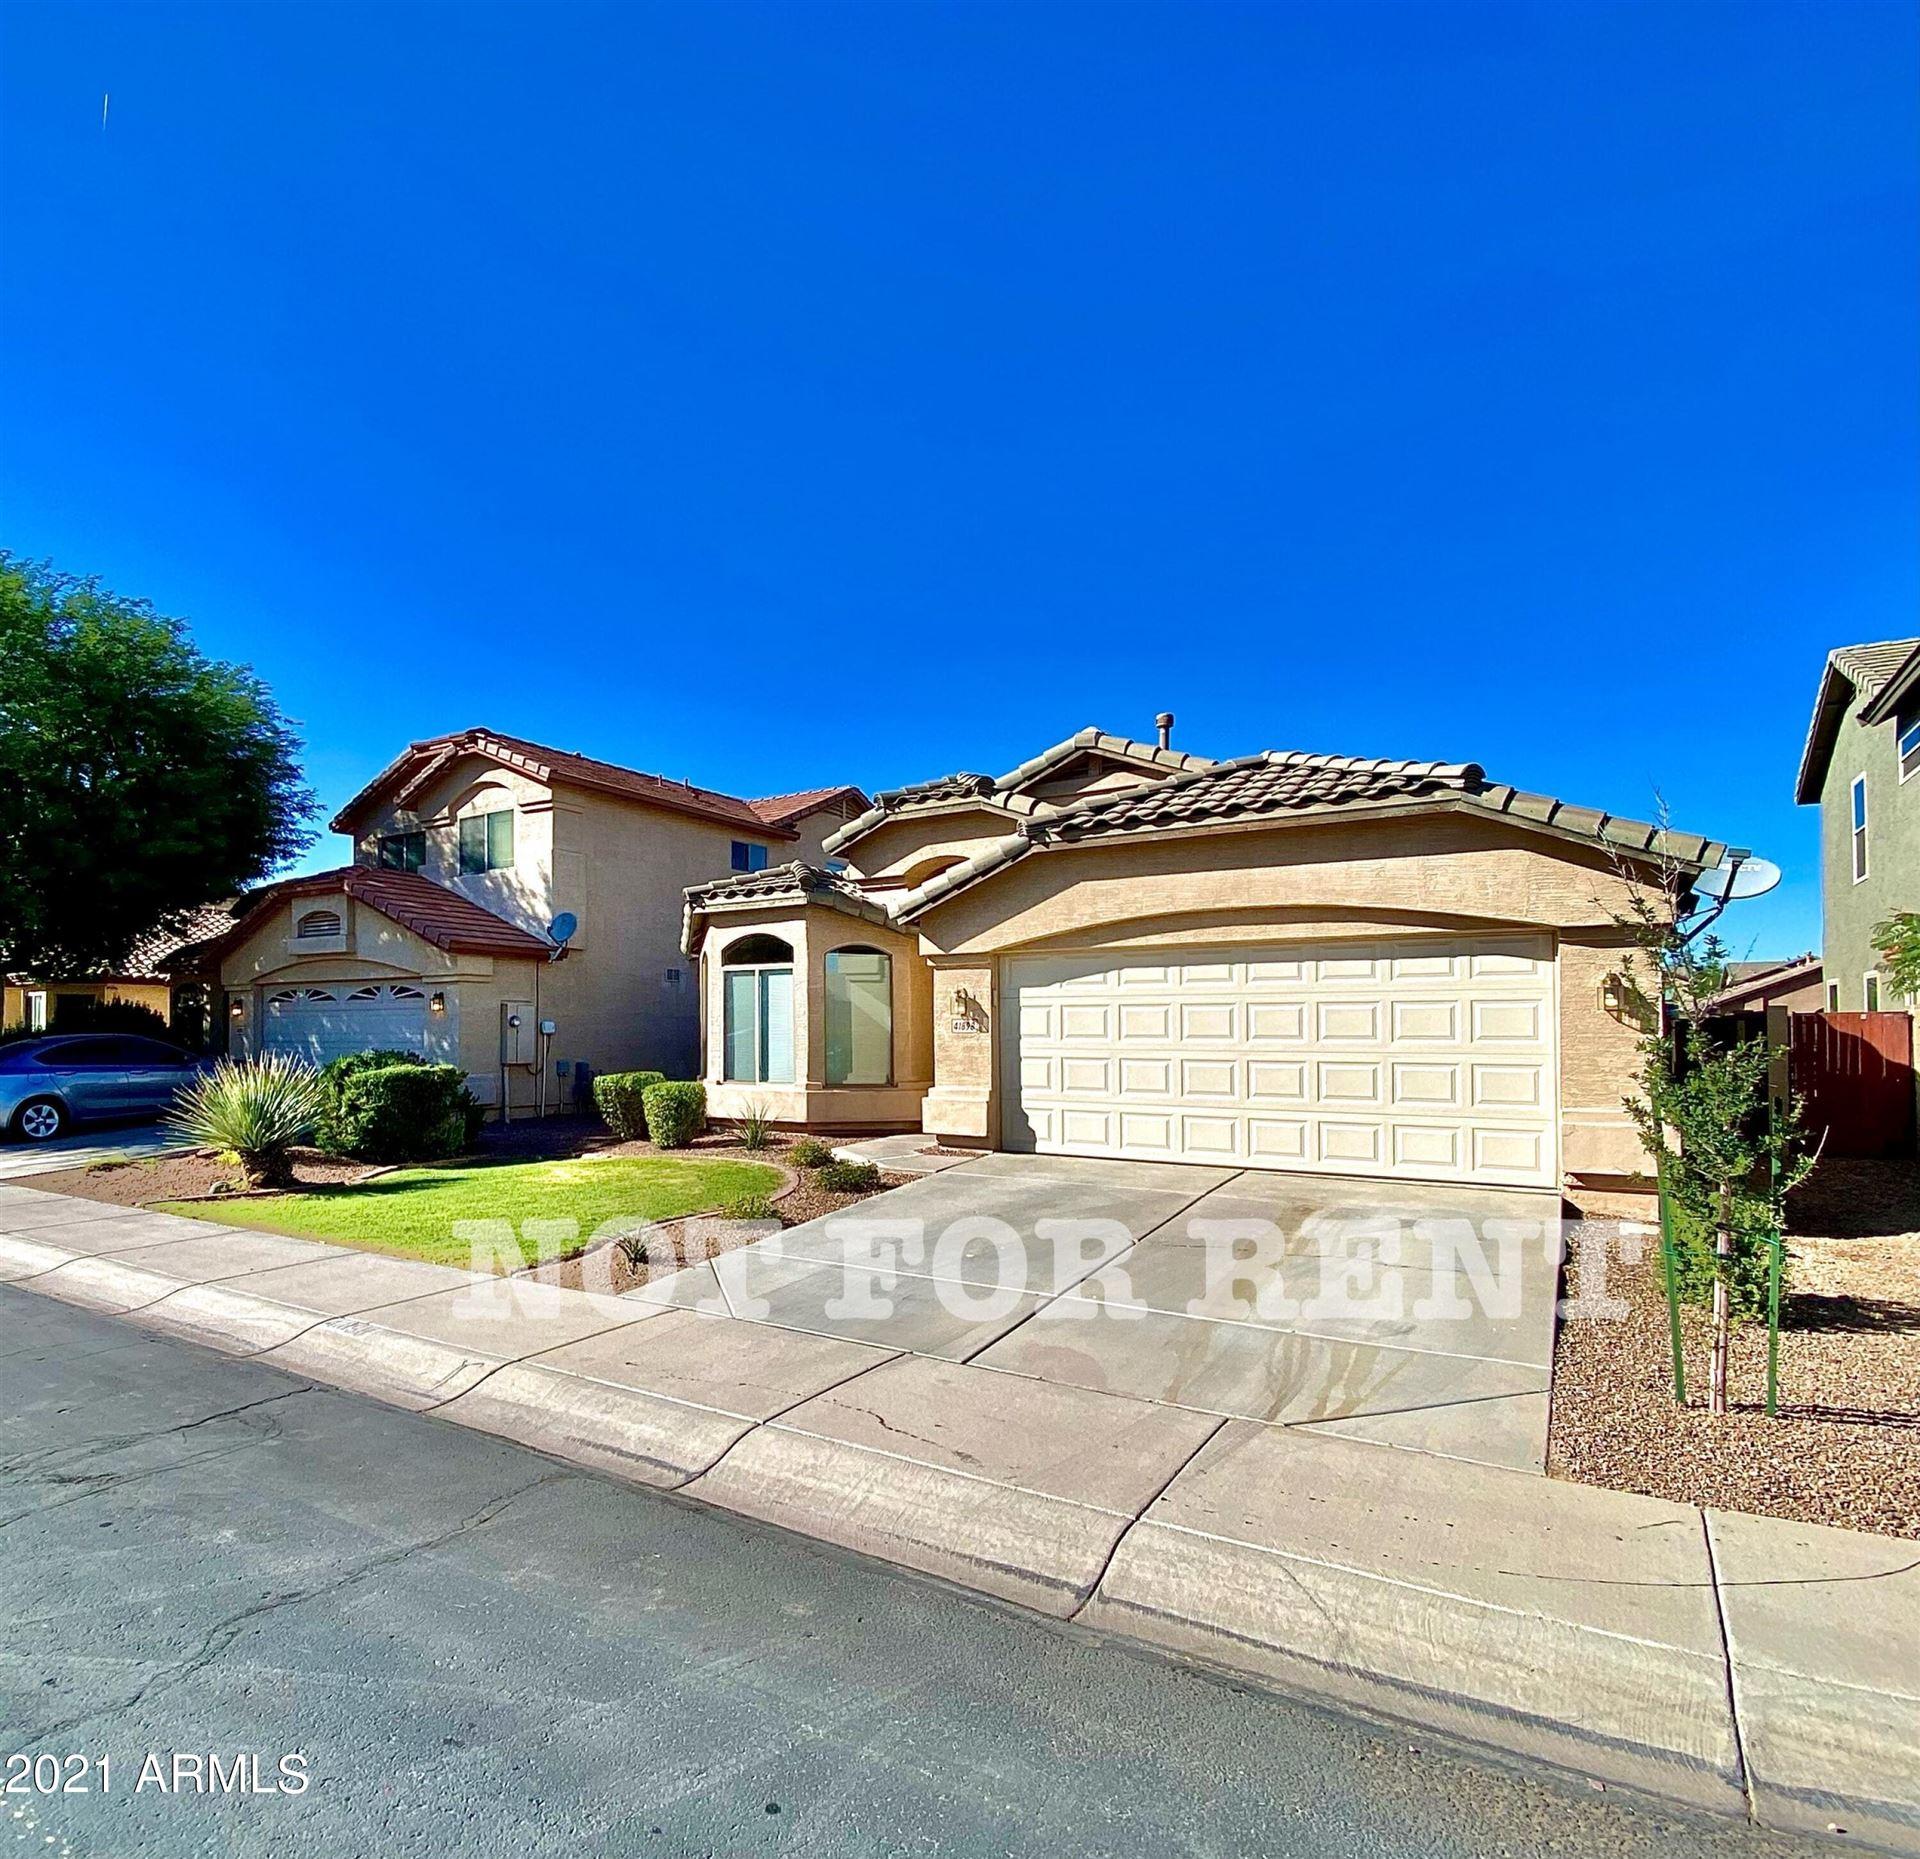 Photo of 41898 W COLBY Drive, Maricopa, AZ 85138 (MLS # 6307903)